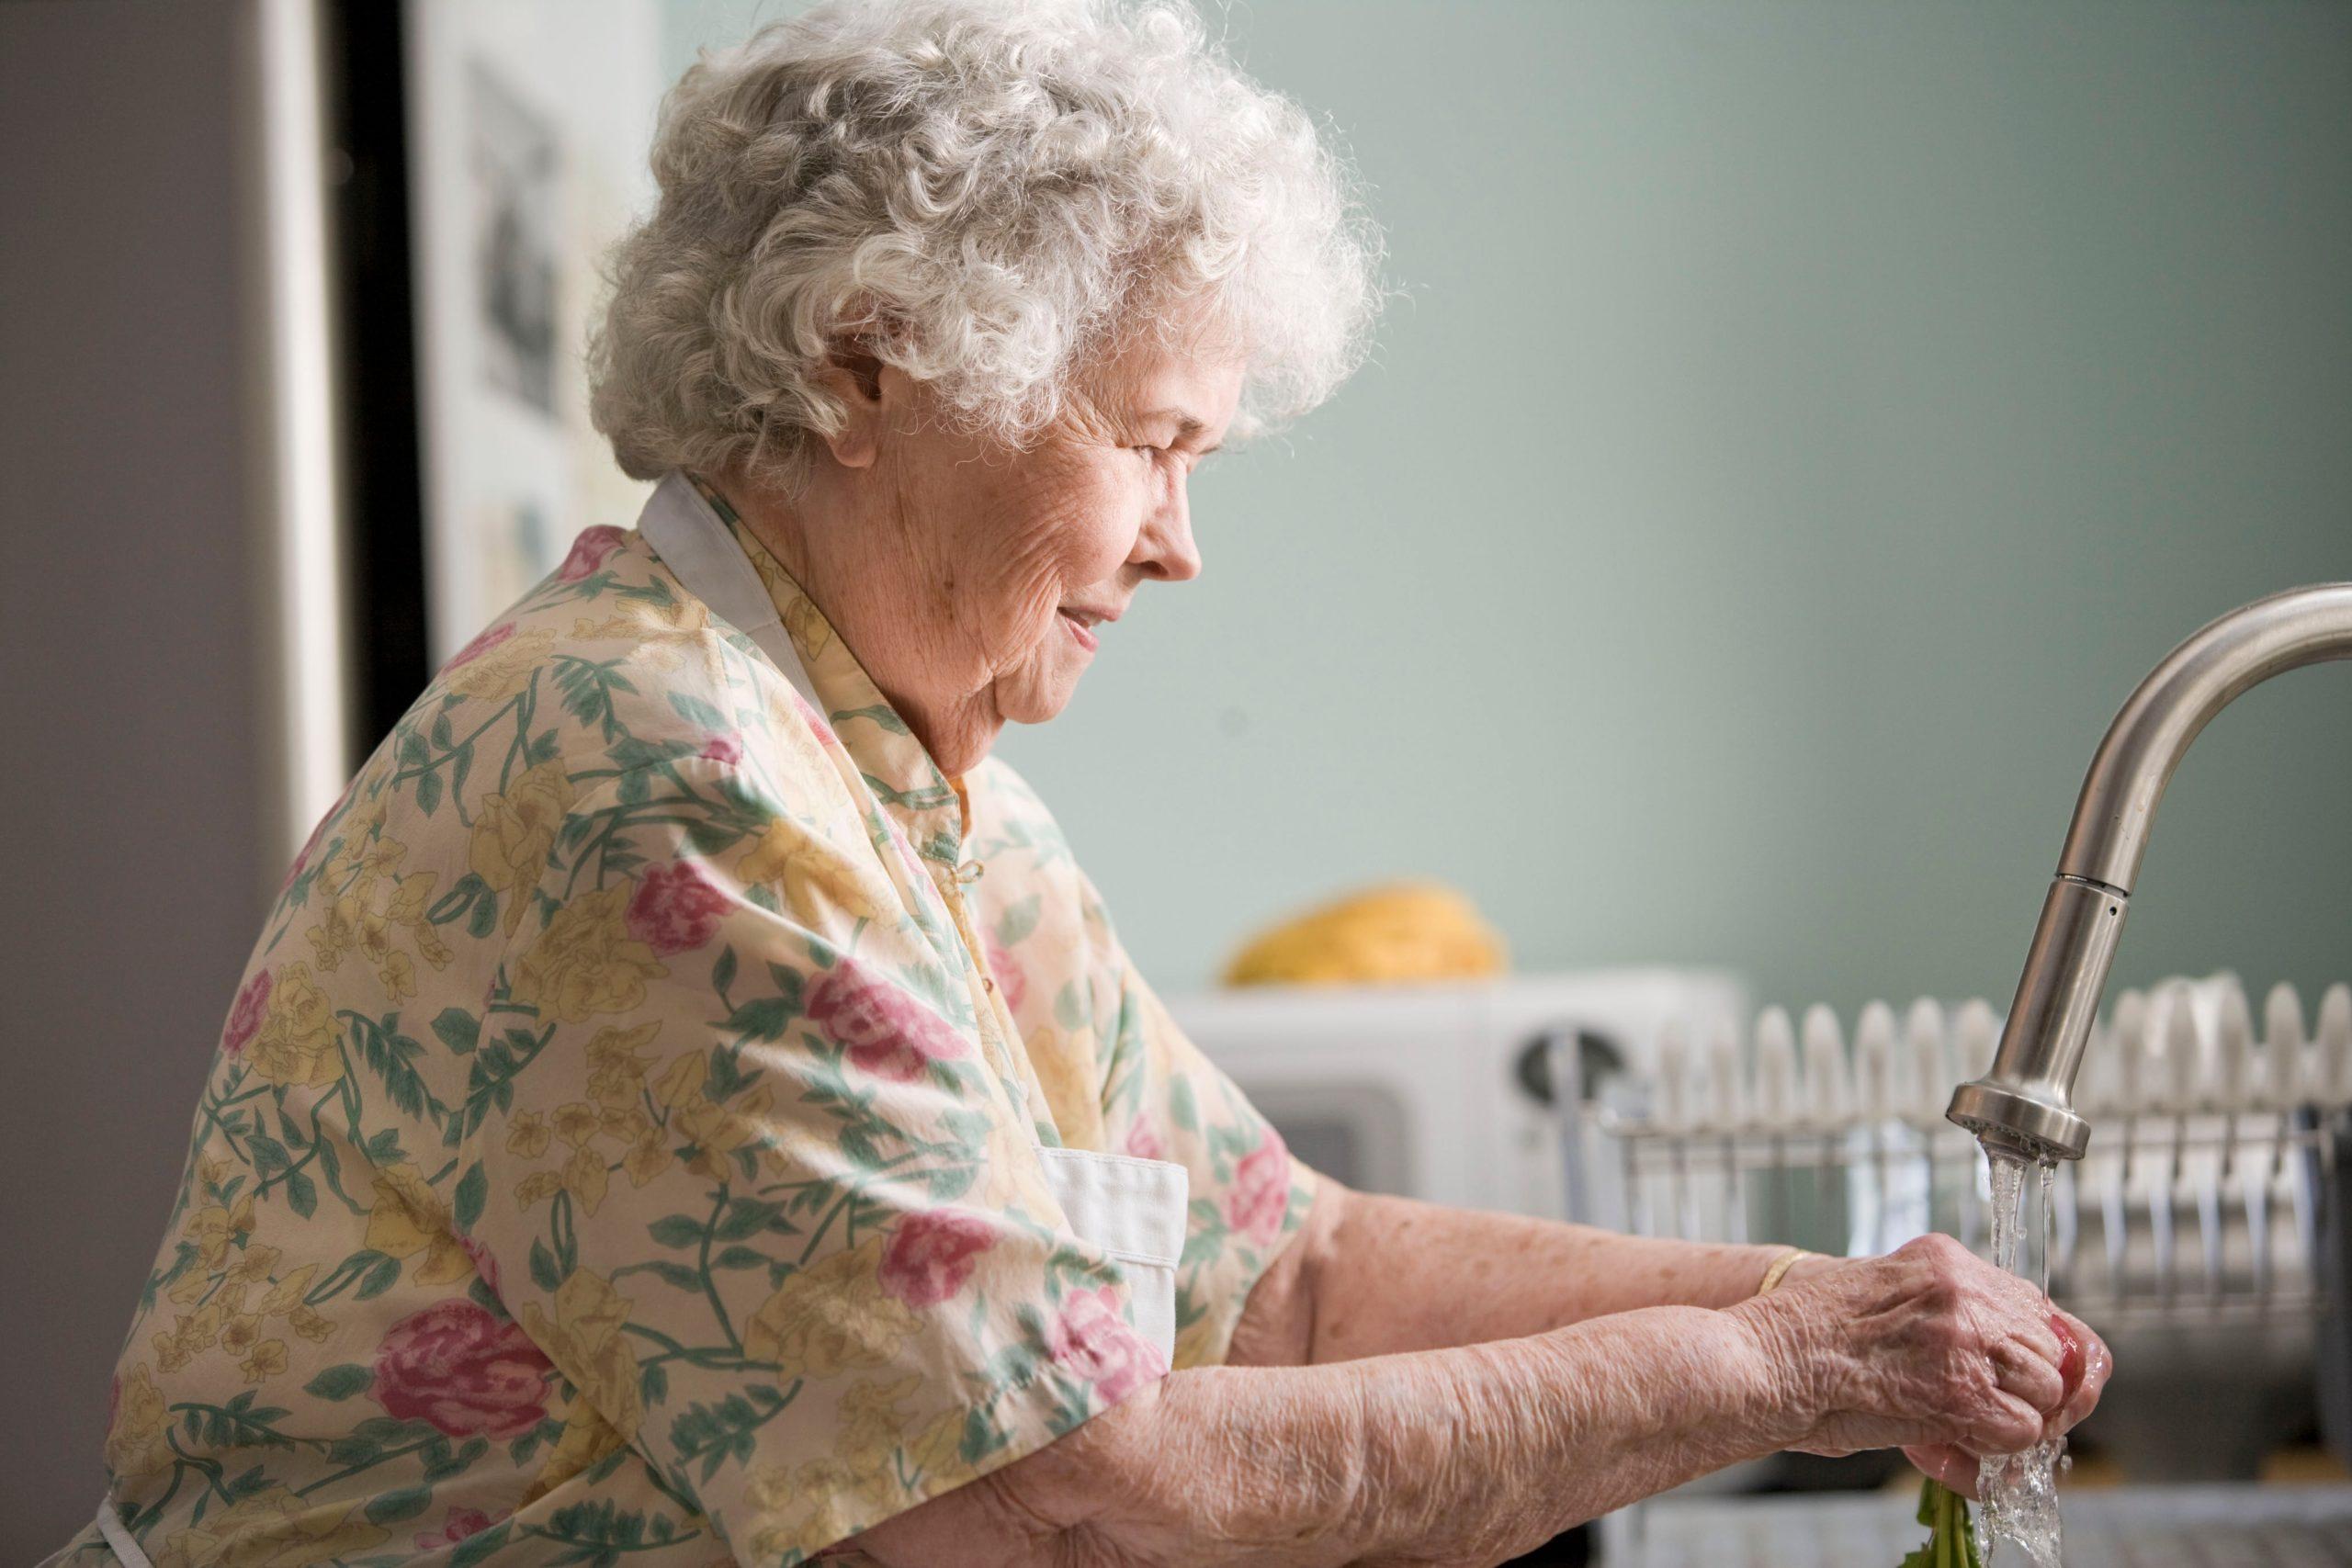 Older woman washing produce